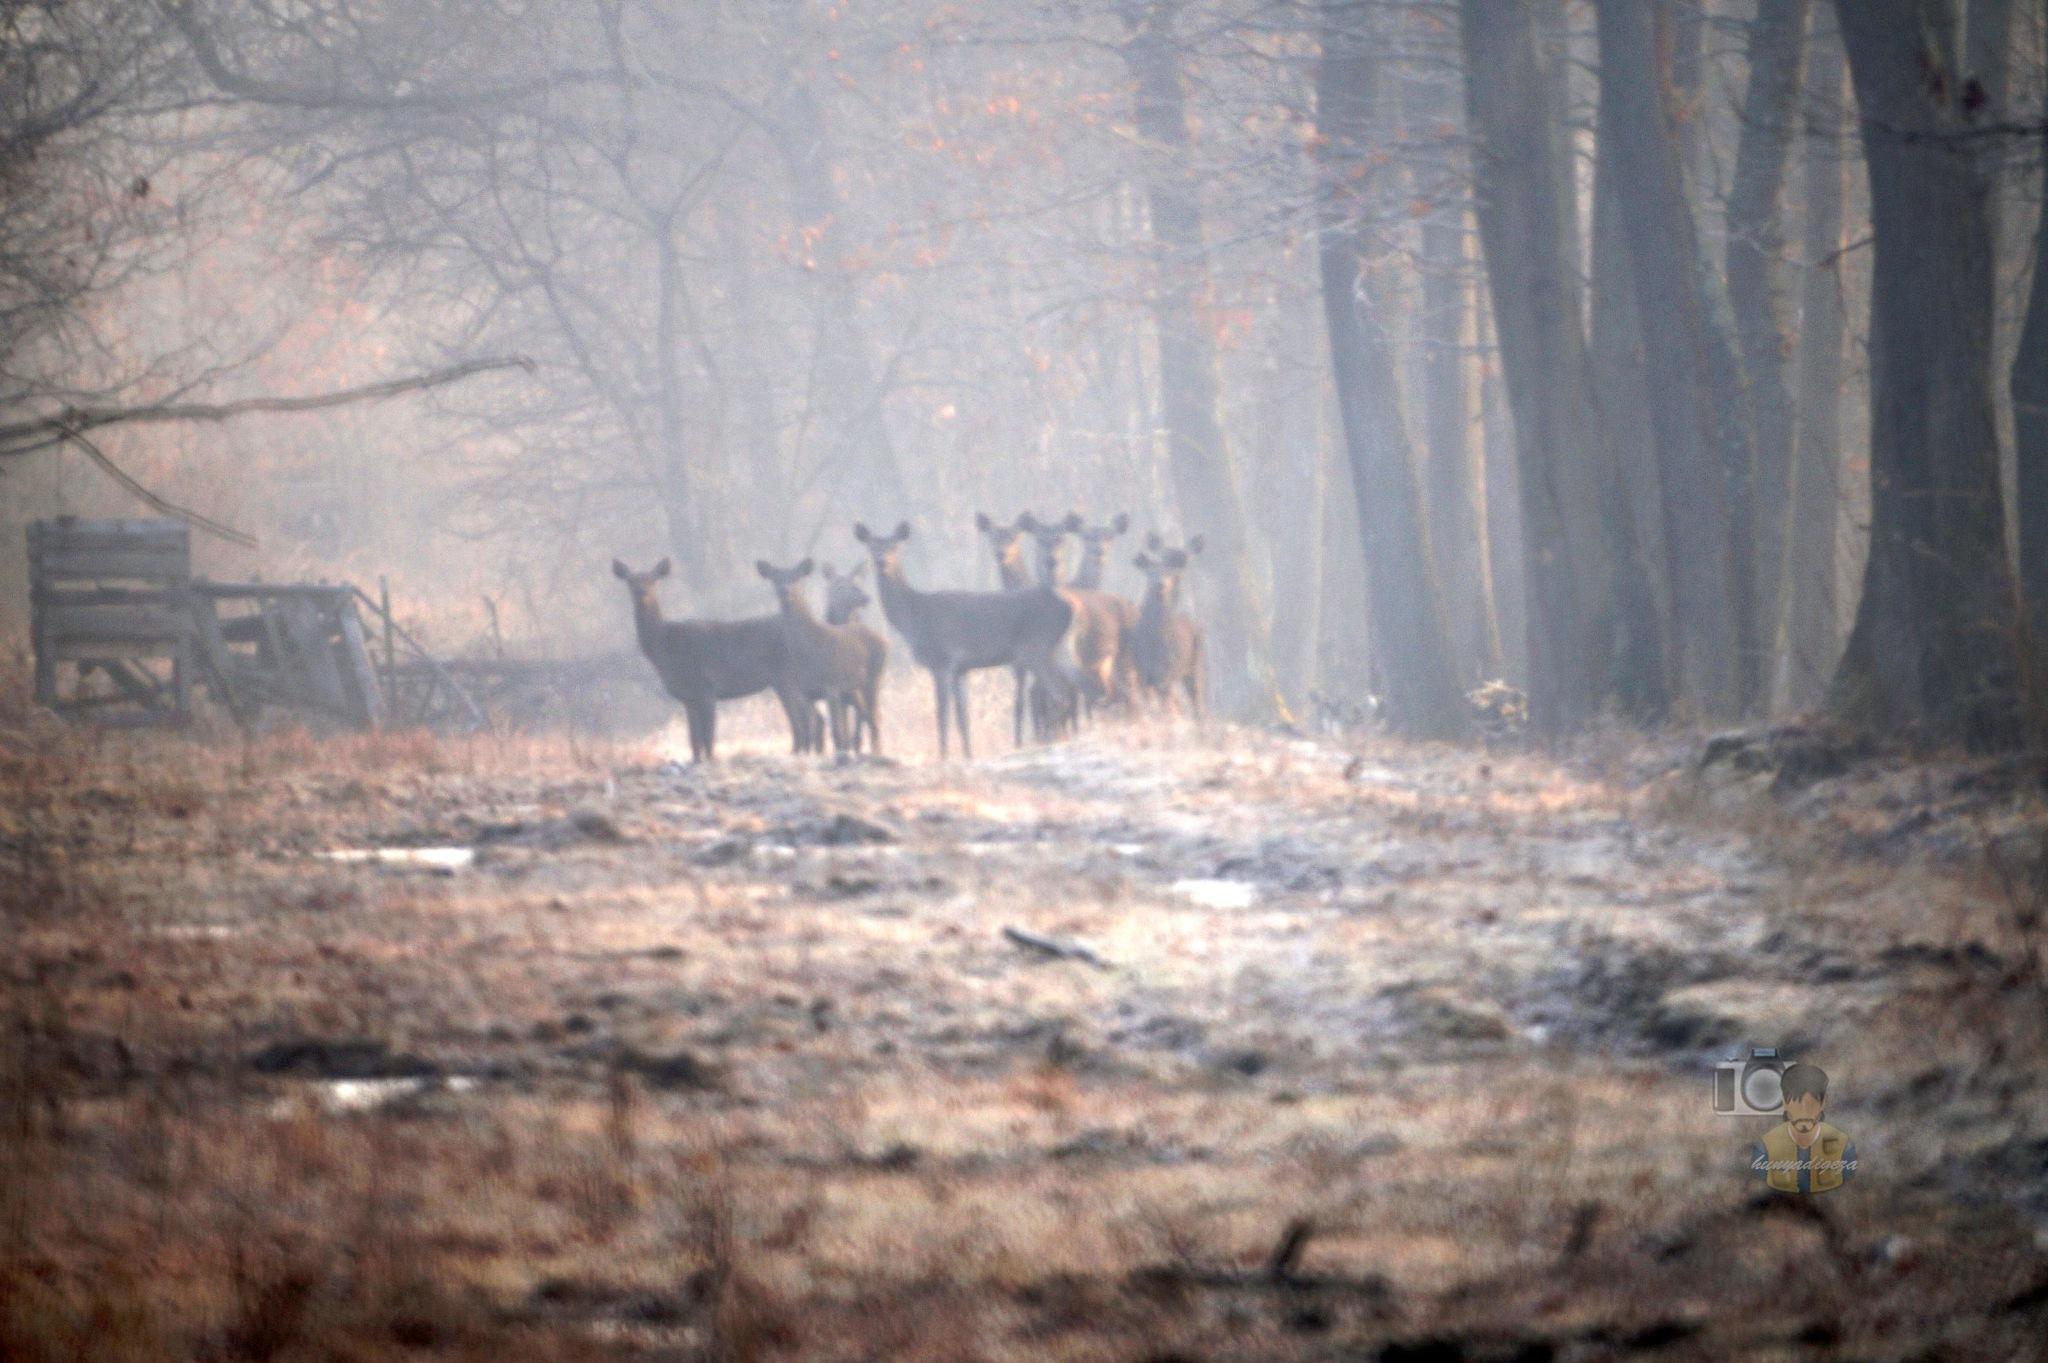 Febr.14, red deers on frosty, foggy forest path by hunyadigeza